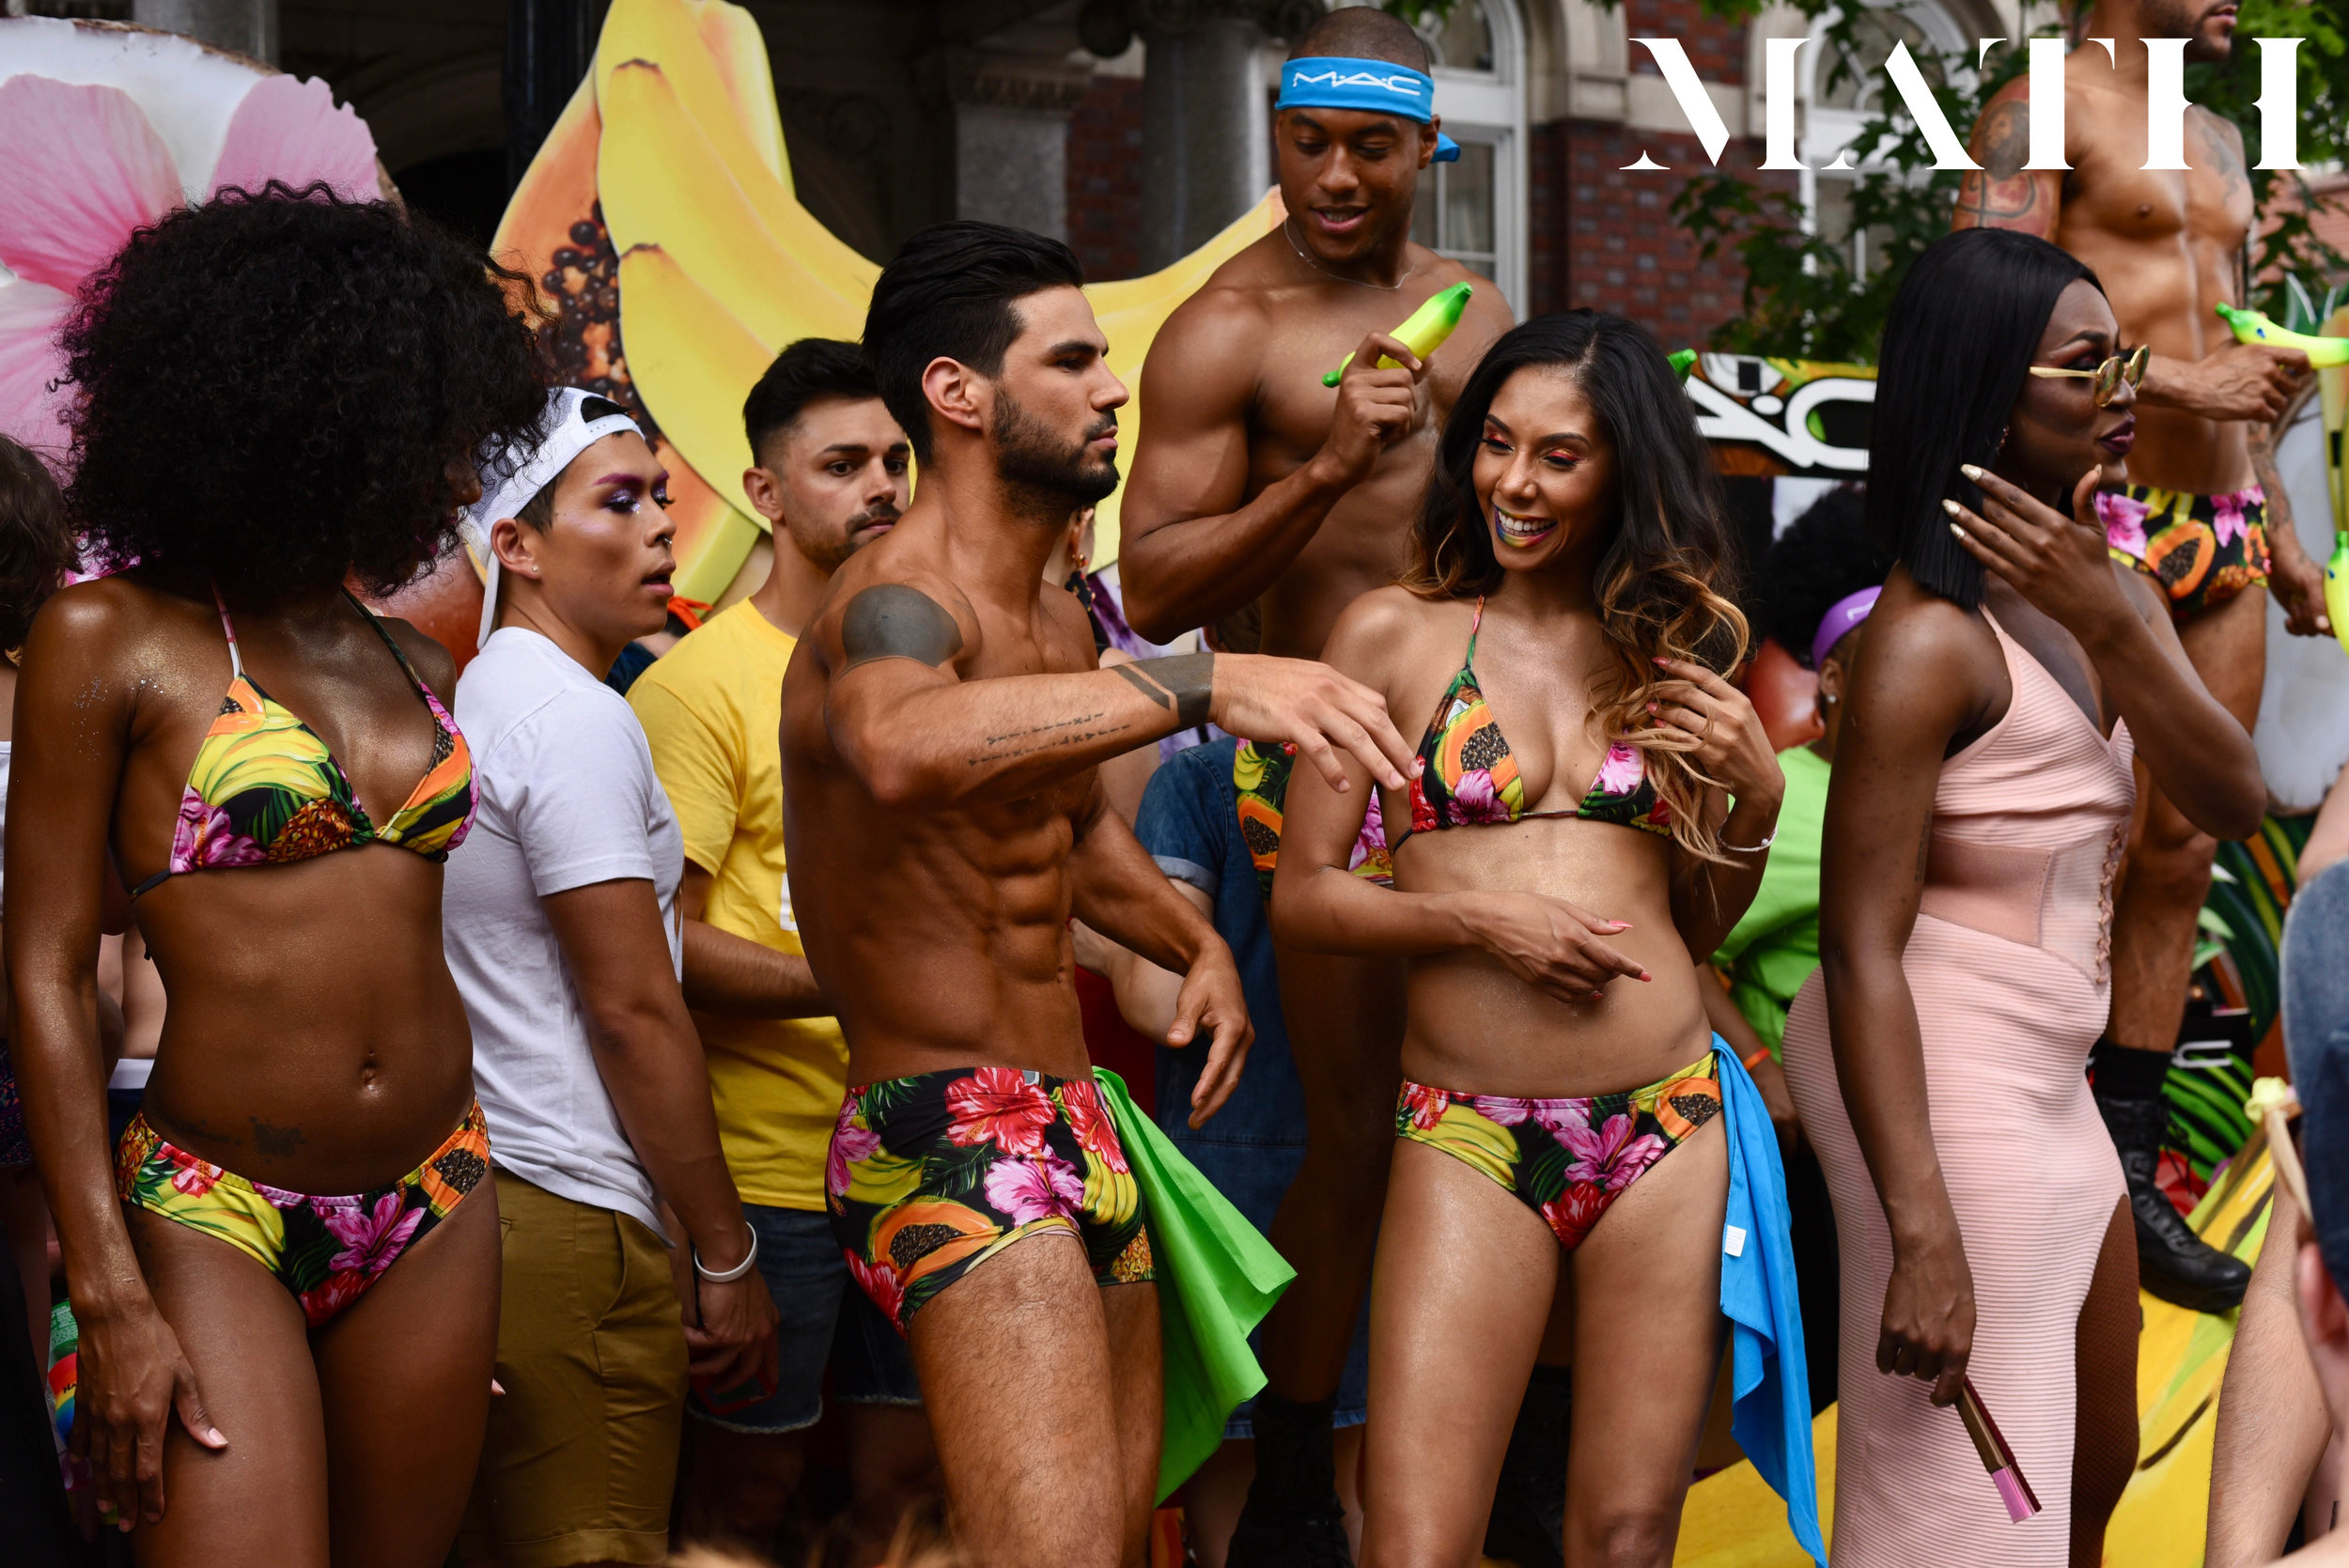 NYC Pride_Ginger Hollander 4.jpg